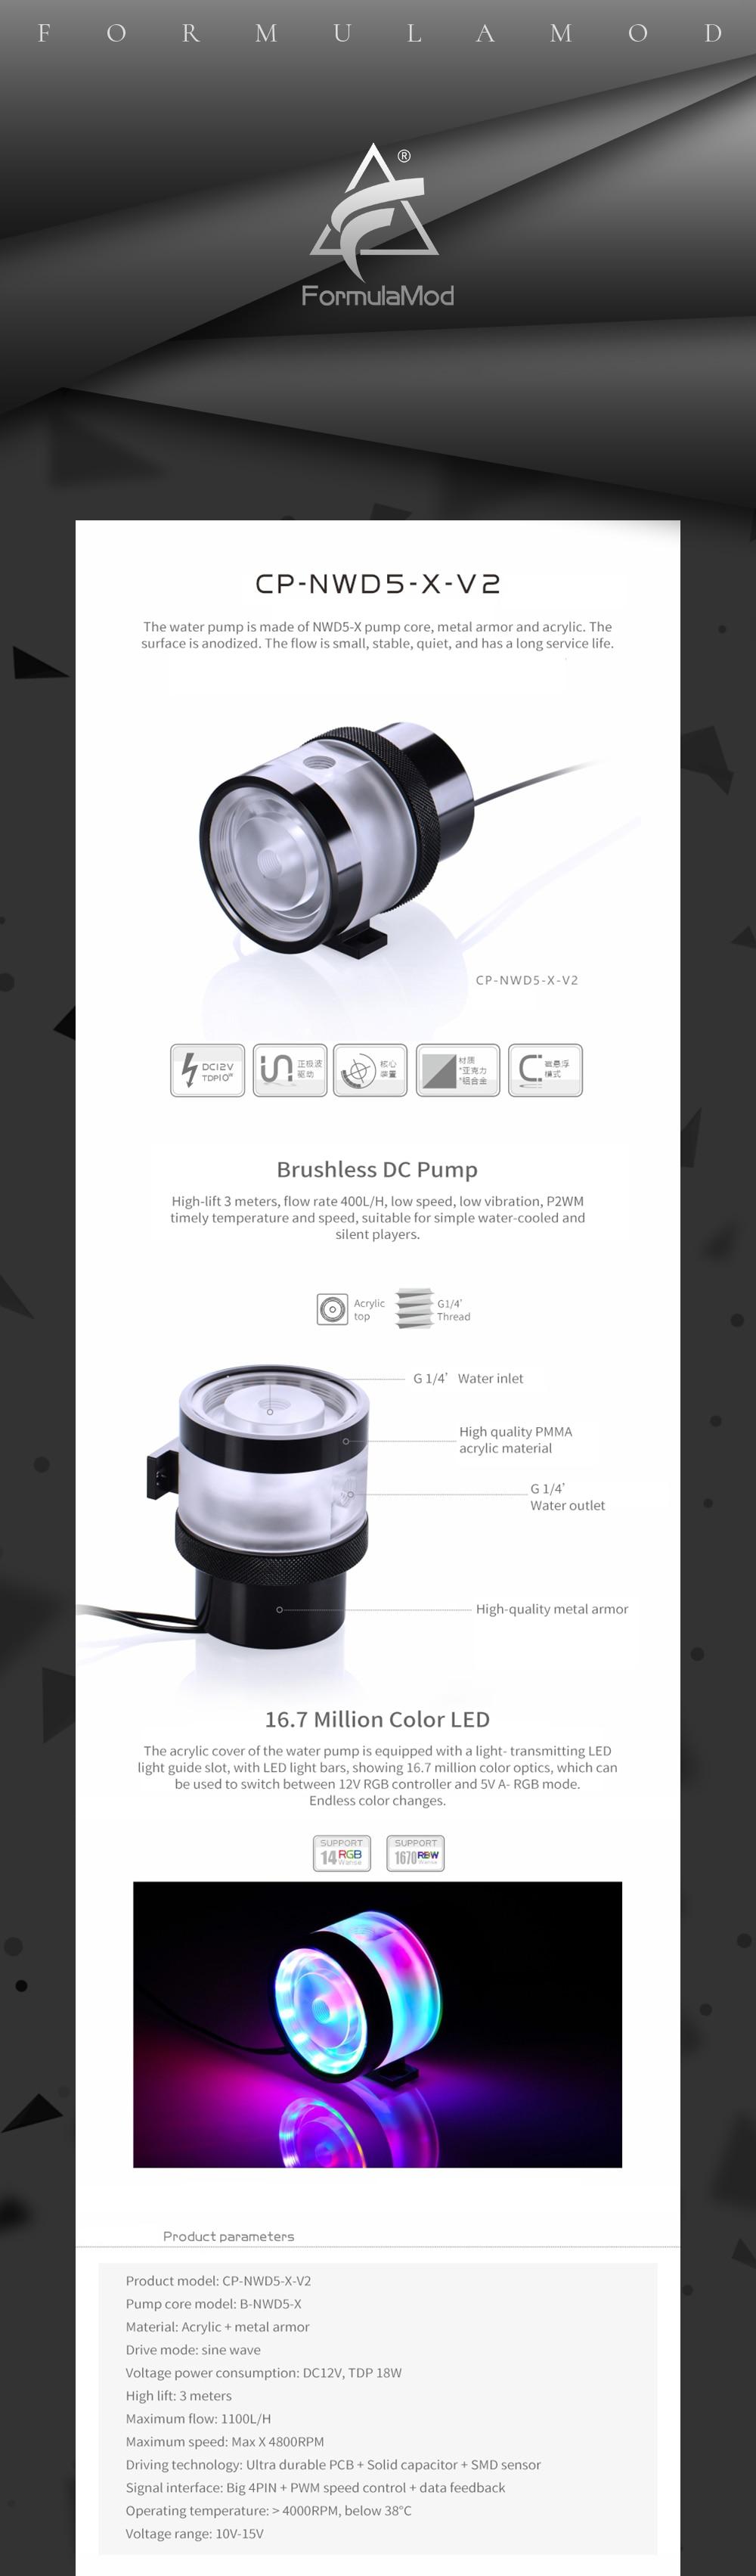 Bykski D5 PWM Water Cooling Pumps, Maximum Flow 1100L/H, Maximum Lift 3.8 Meter, CP-NWD5-X-V2